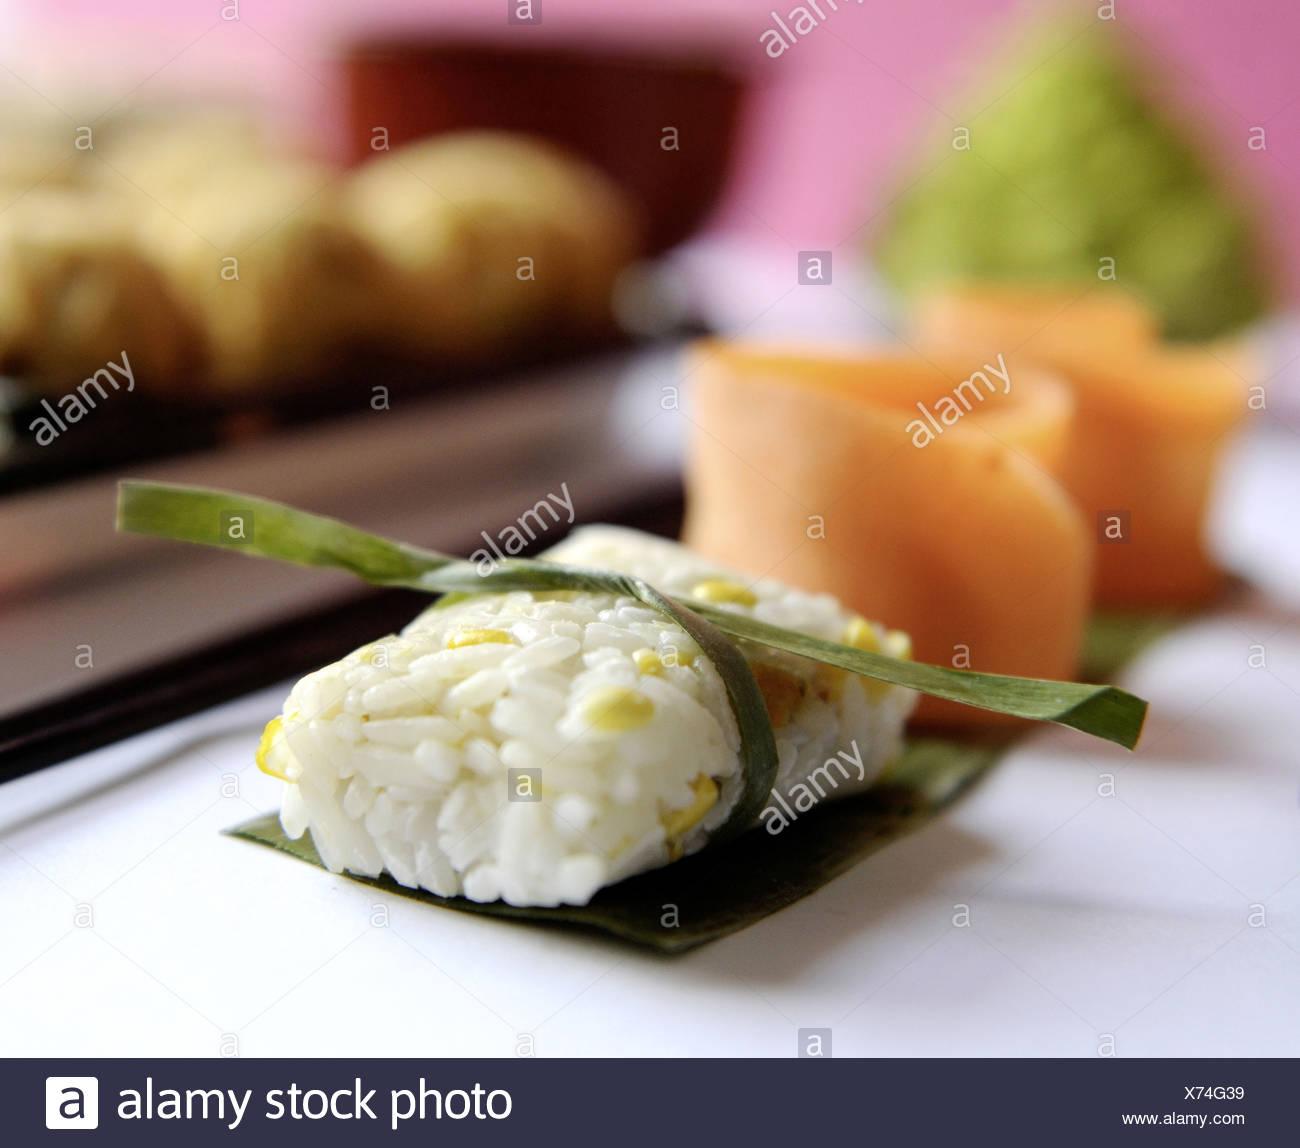 Rice sweet corn dumplings - Stock Image